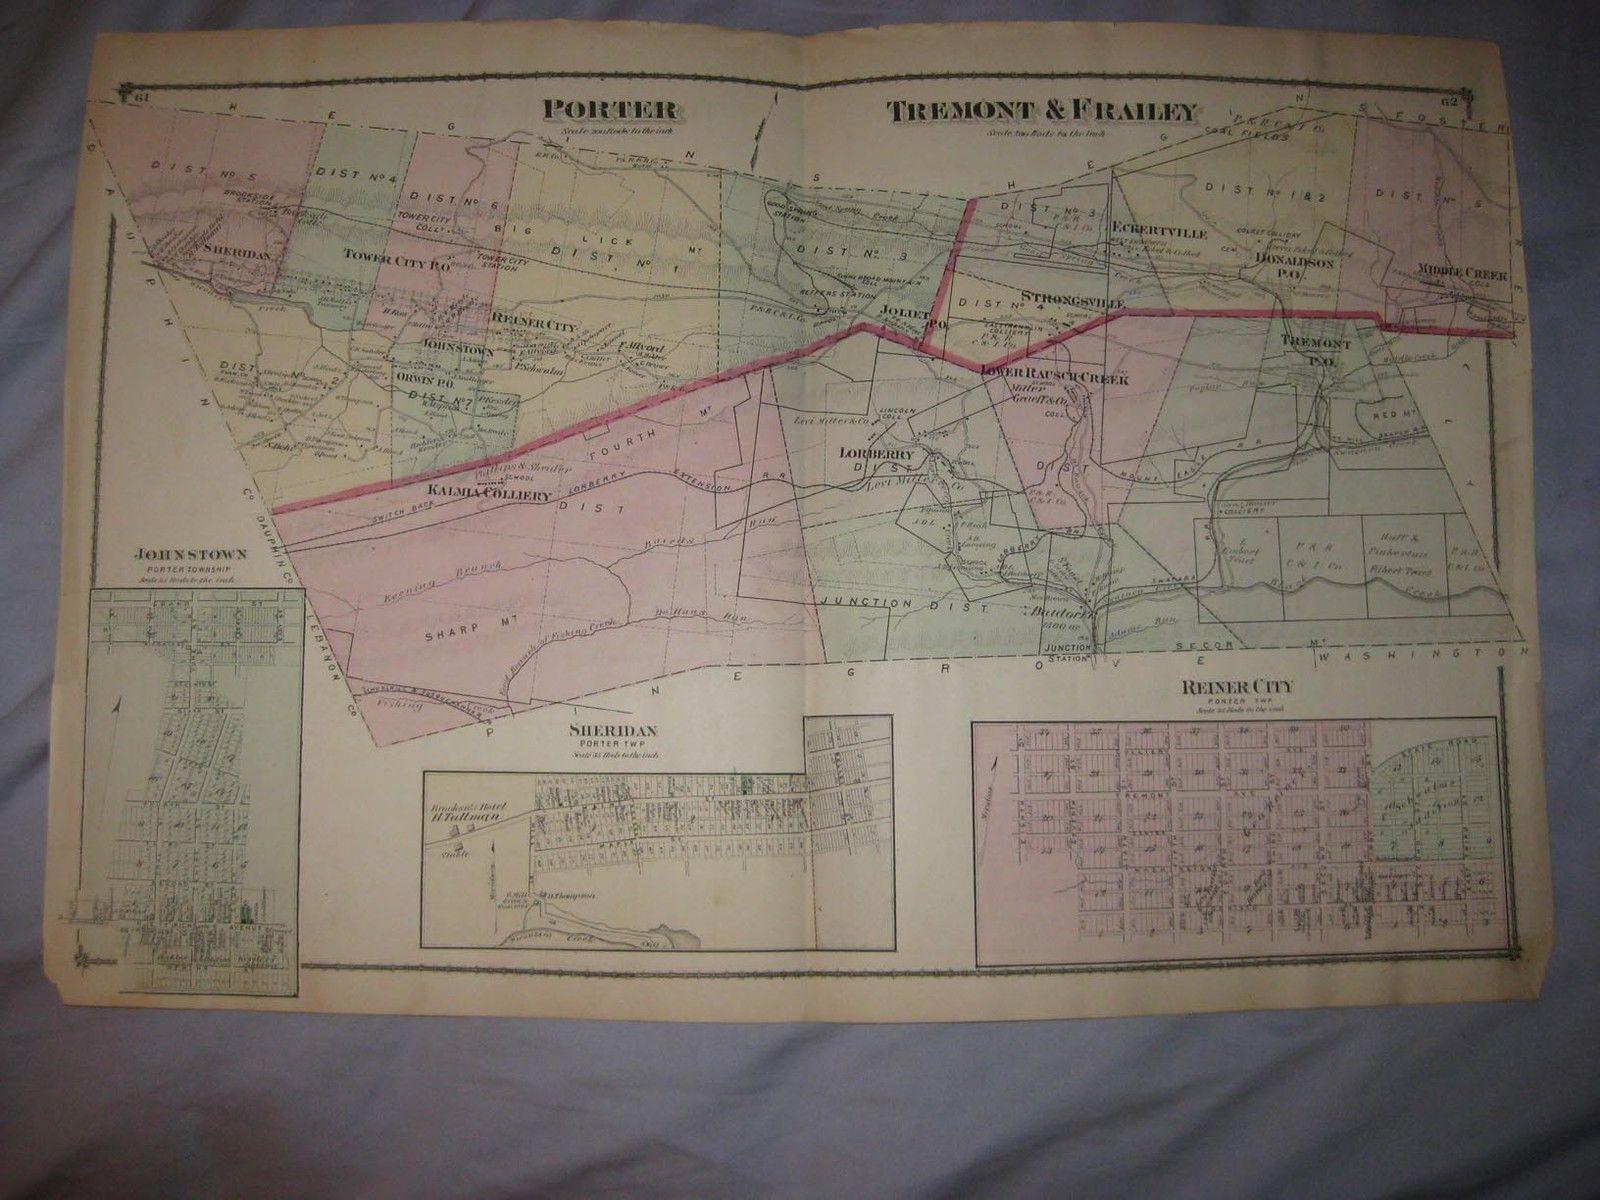 Antique 1875 Porter Tremont Frailey Township Schuylkill County Pennsylvania Map Ebay Schuylkill County Tremont Township